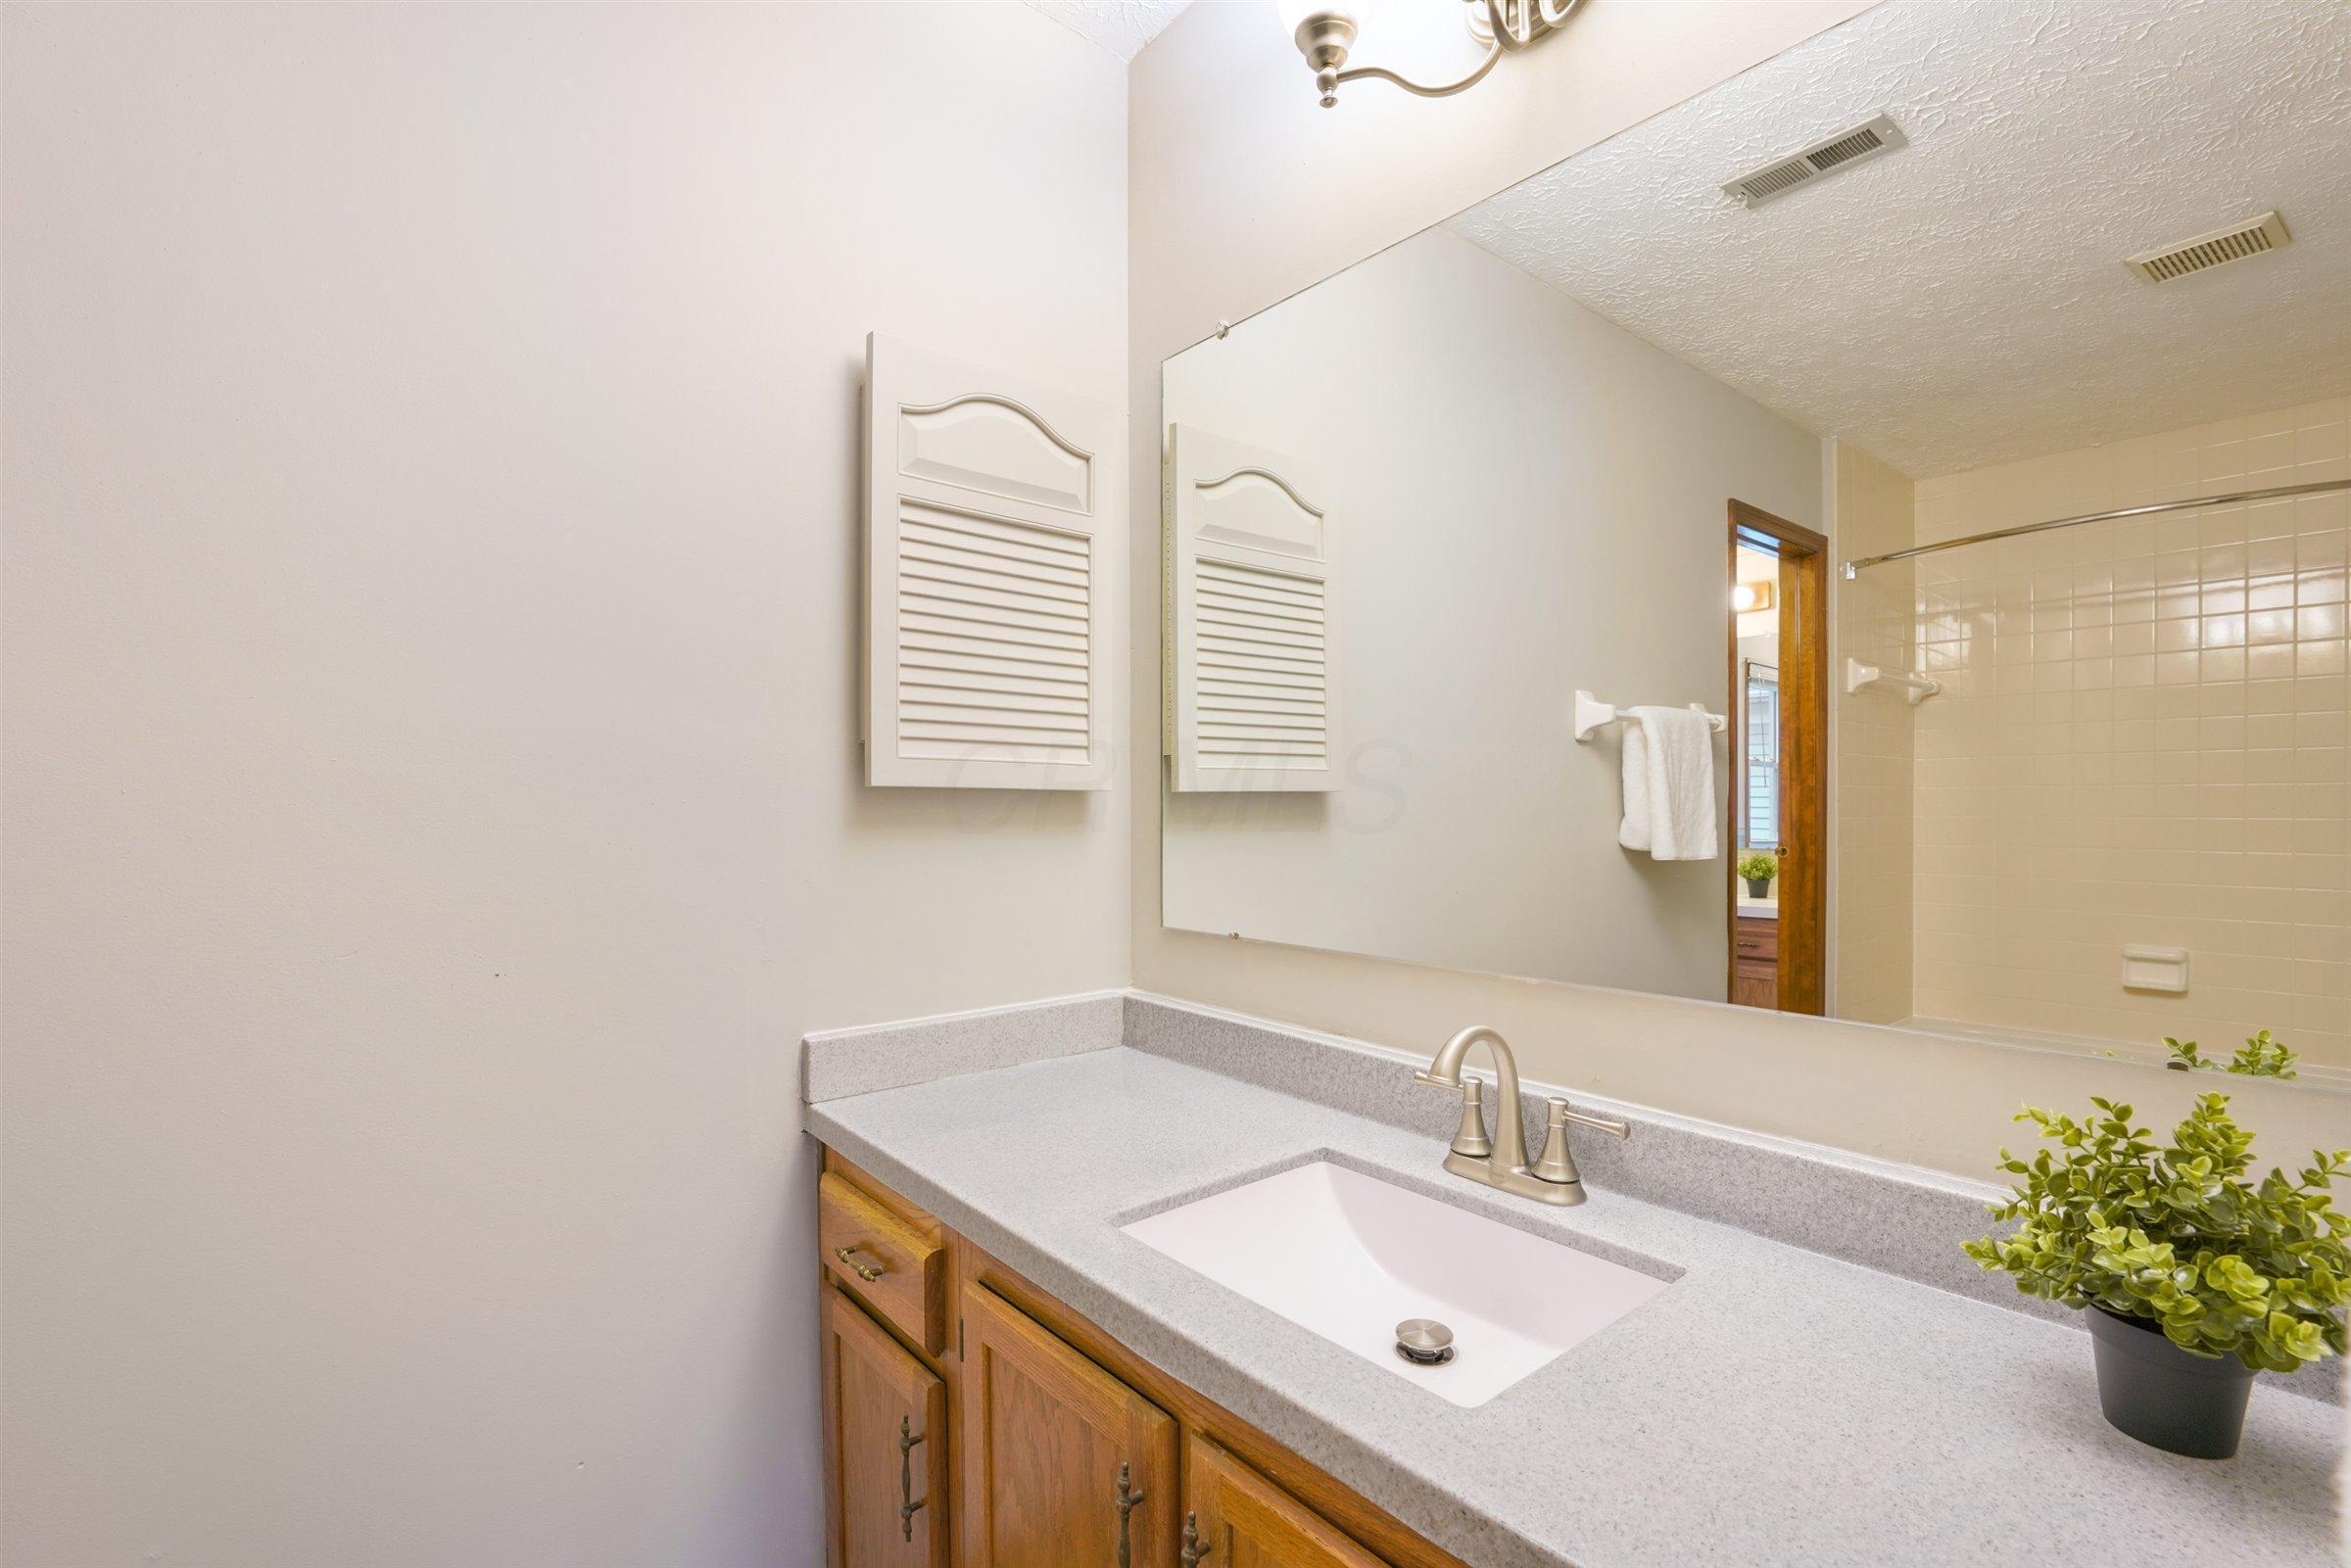 5855 Parkbridge Lane, Dublin, Ohio 43016, 2 Bedrooms Bedrooms, ,2 BathroomsBathrooms,Residential,For Sale,Parkbridge,220038448